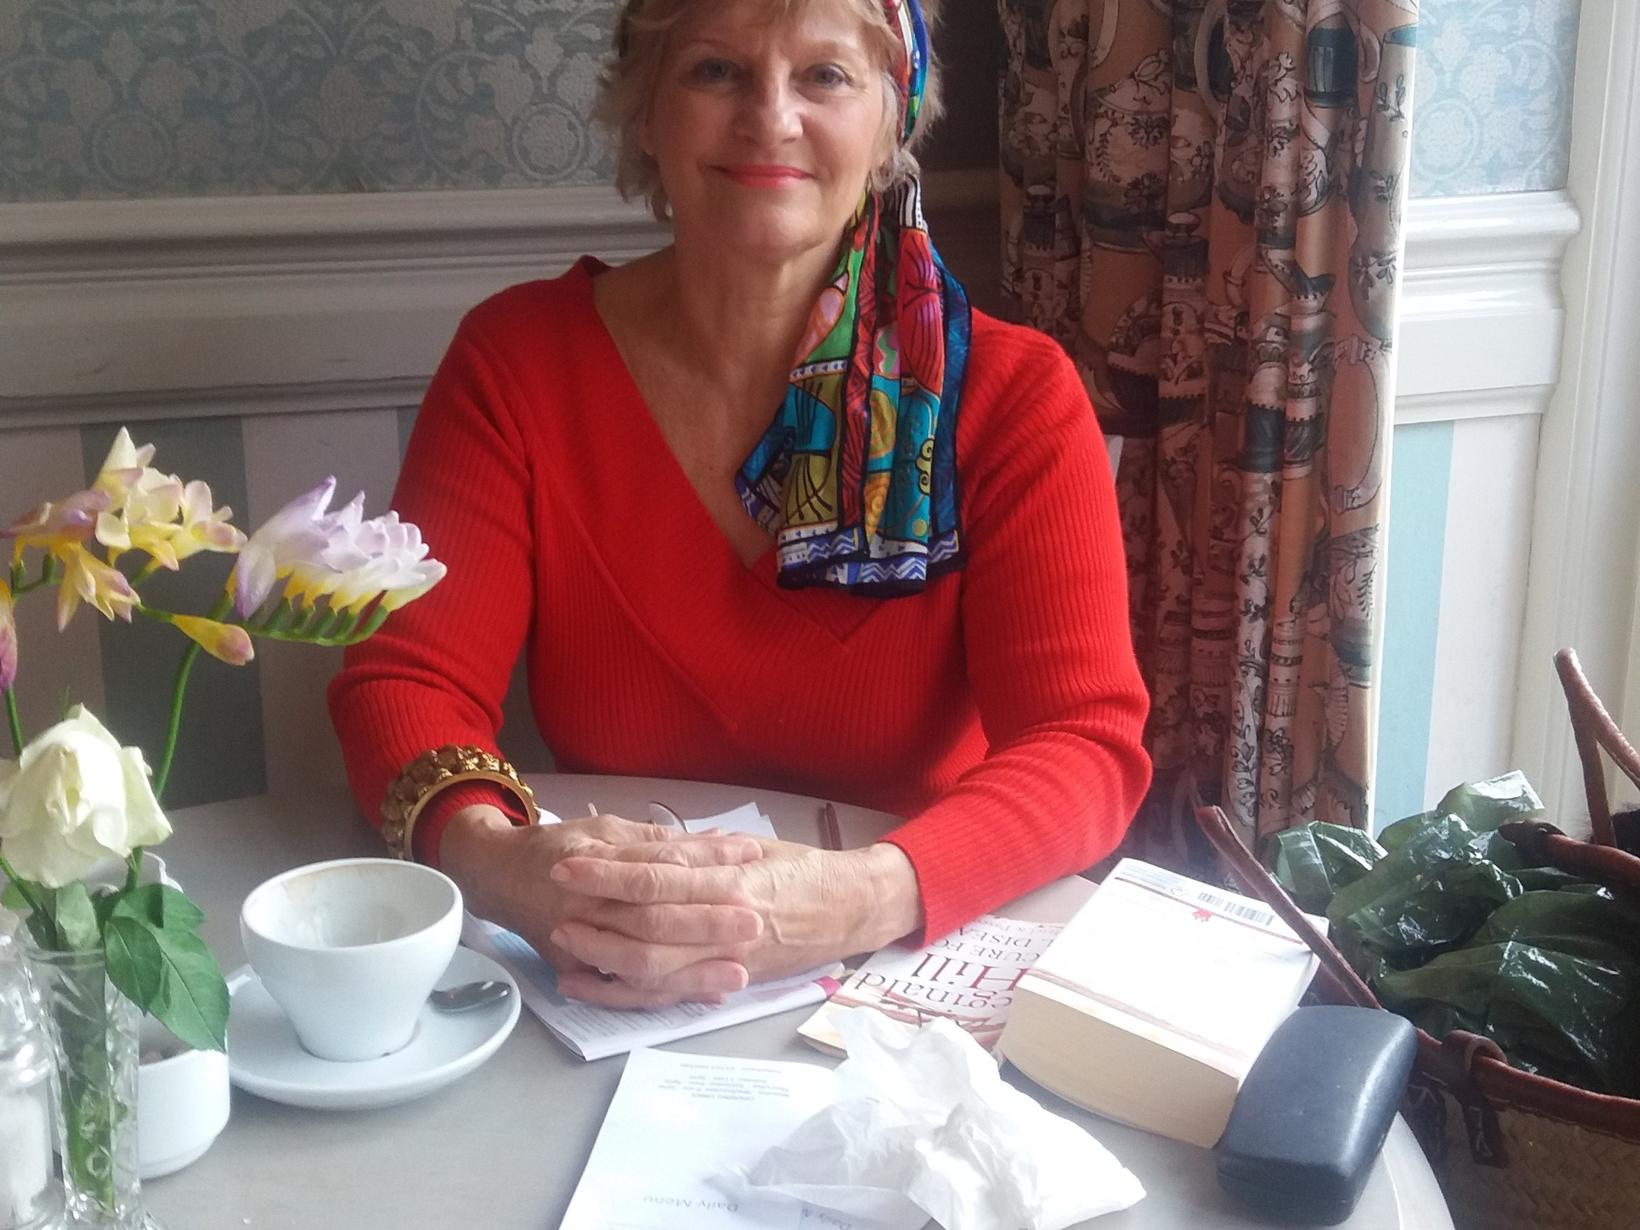 Joan from Upwell, United Kingdom